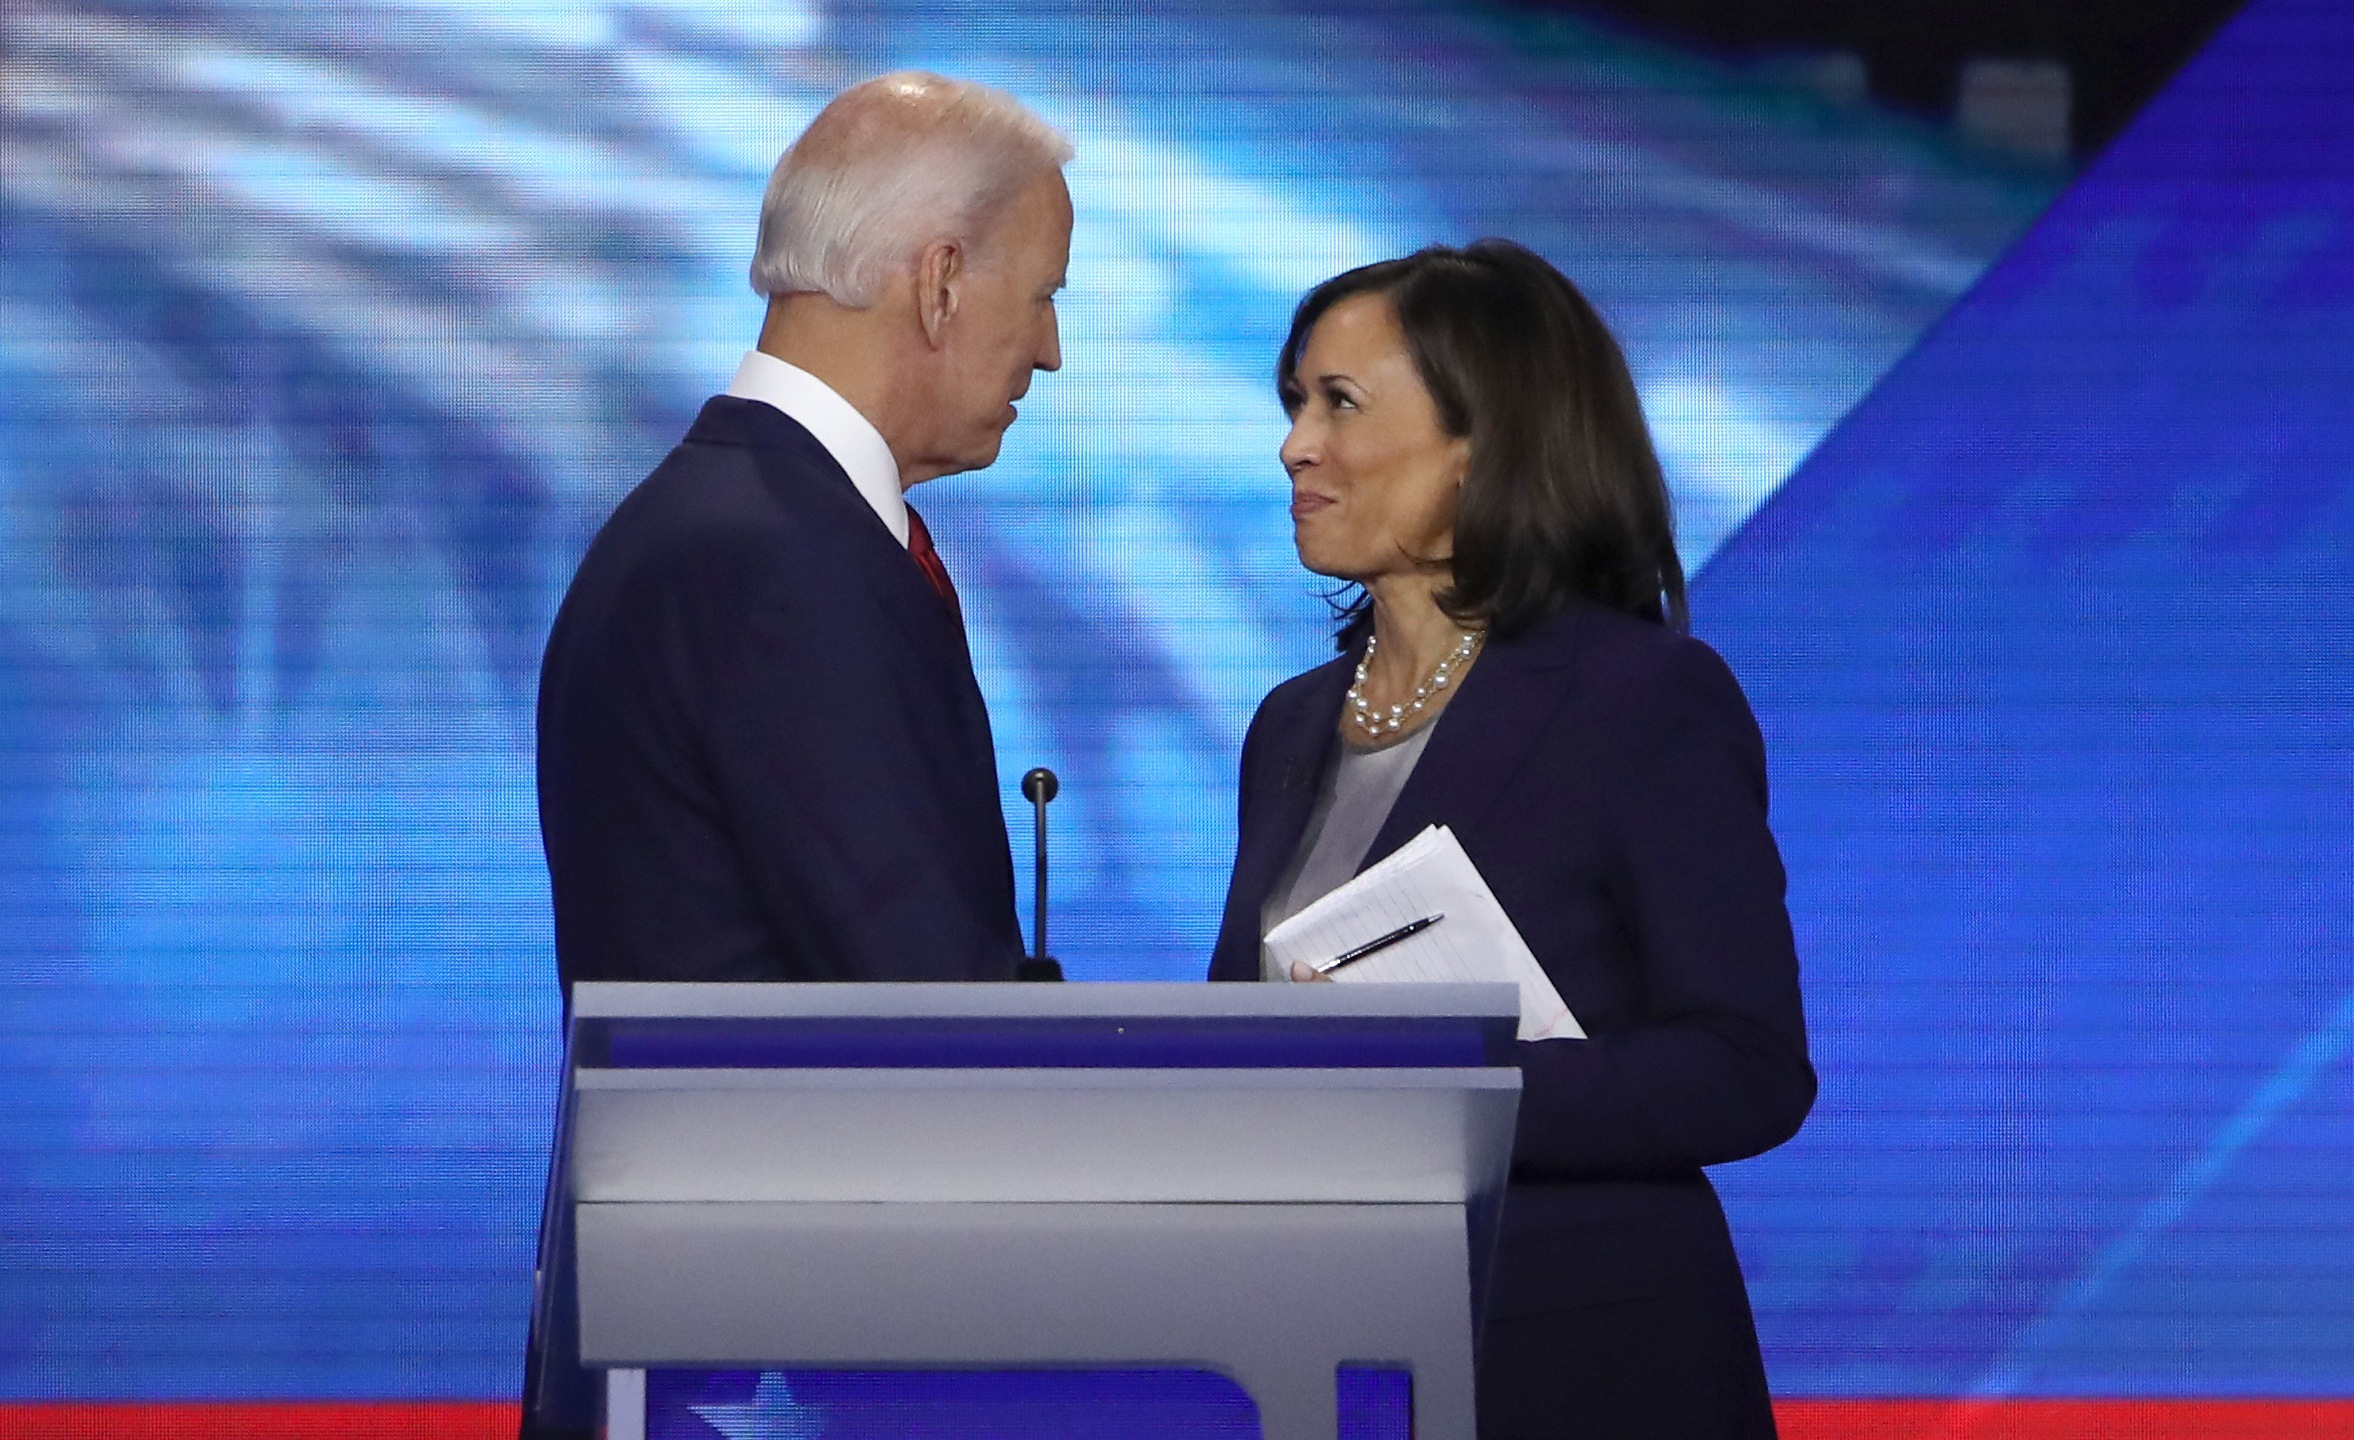 Joe Biden and Kamala Harris speak after the Democratic presidential debate at Texas Southern University on Sept. 12, 2019 in Houston. (Credit: Win McNamee/Getty Images)